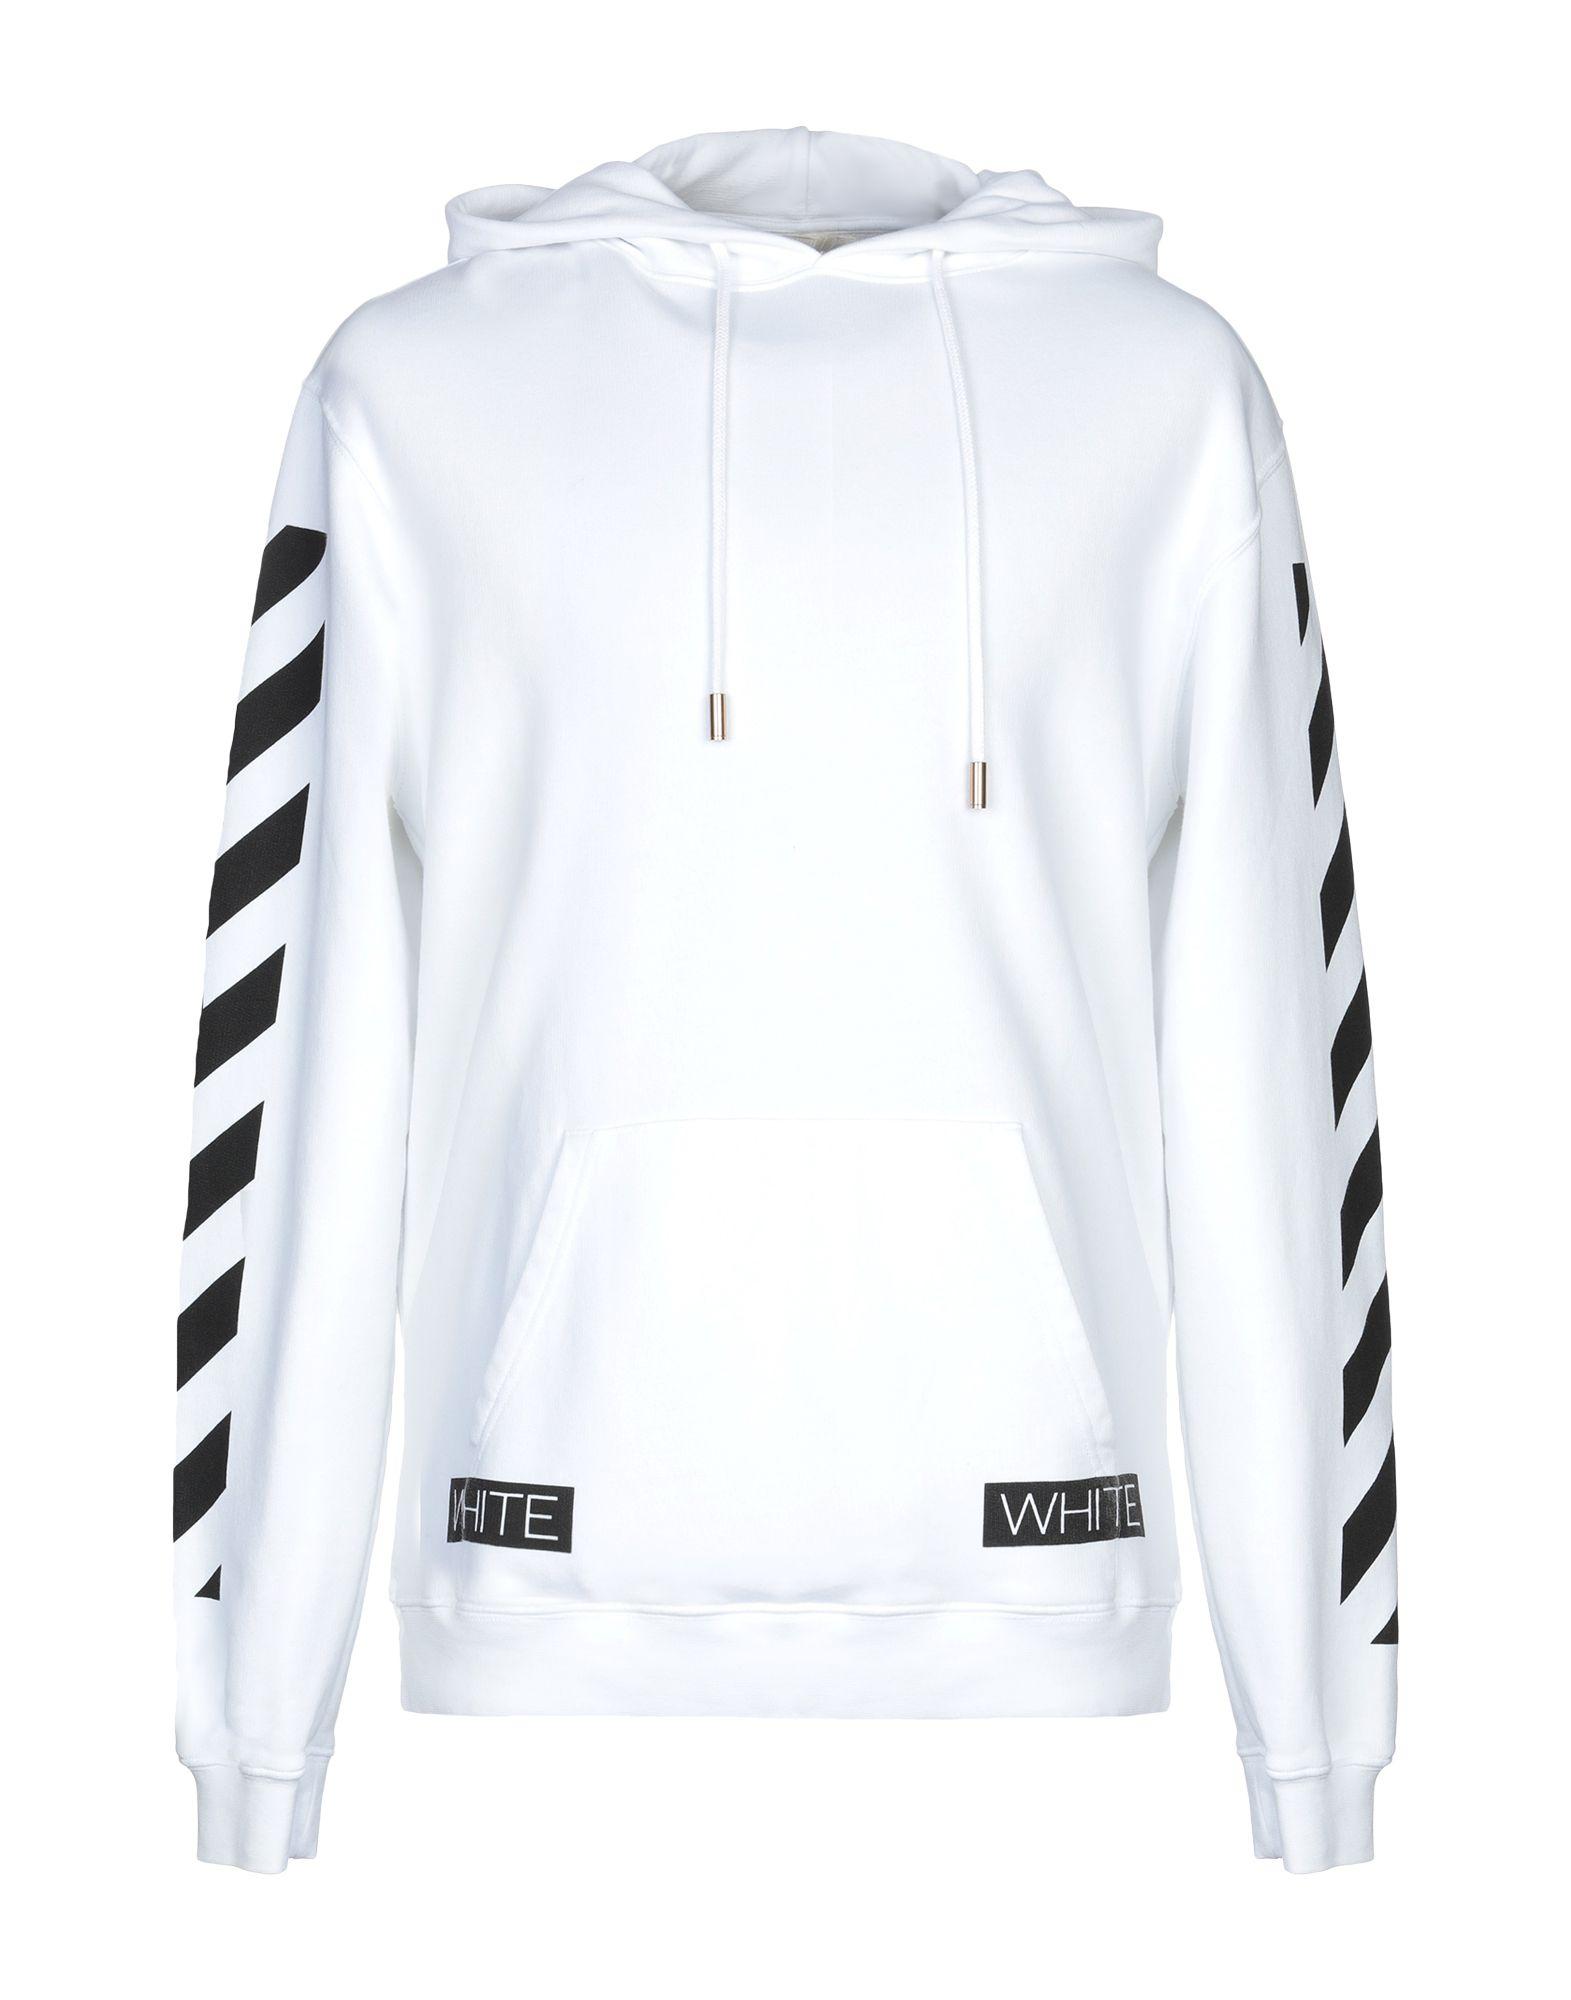 OFF-WHITE™ Толстовка толстовка revolution fill up off white m